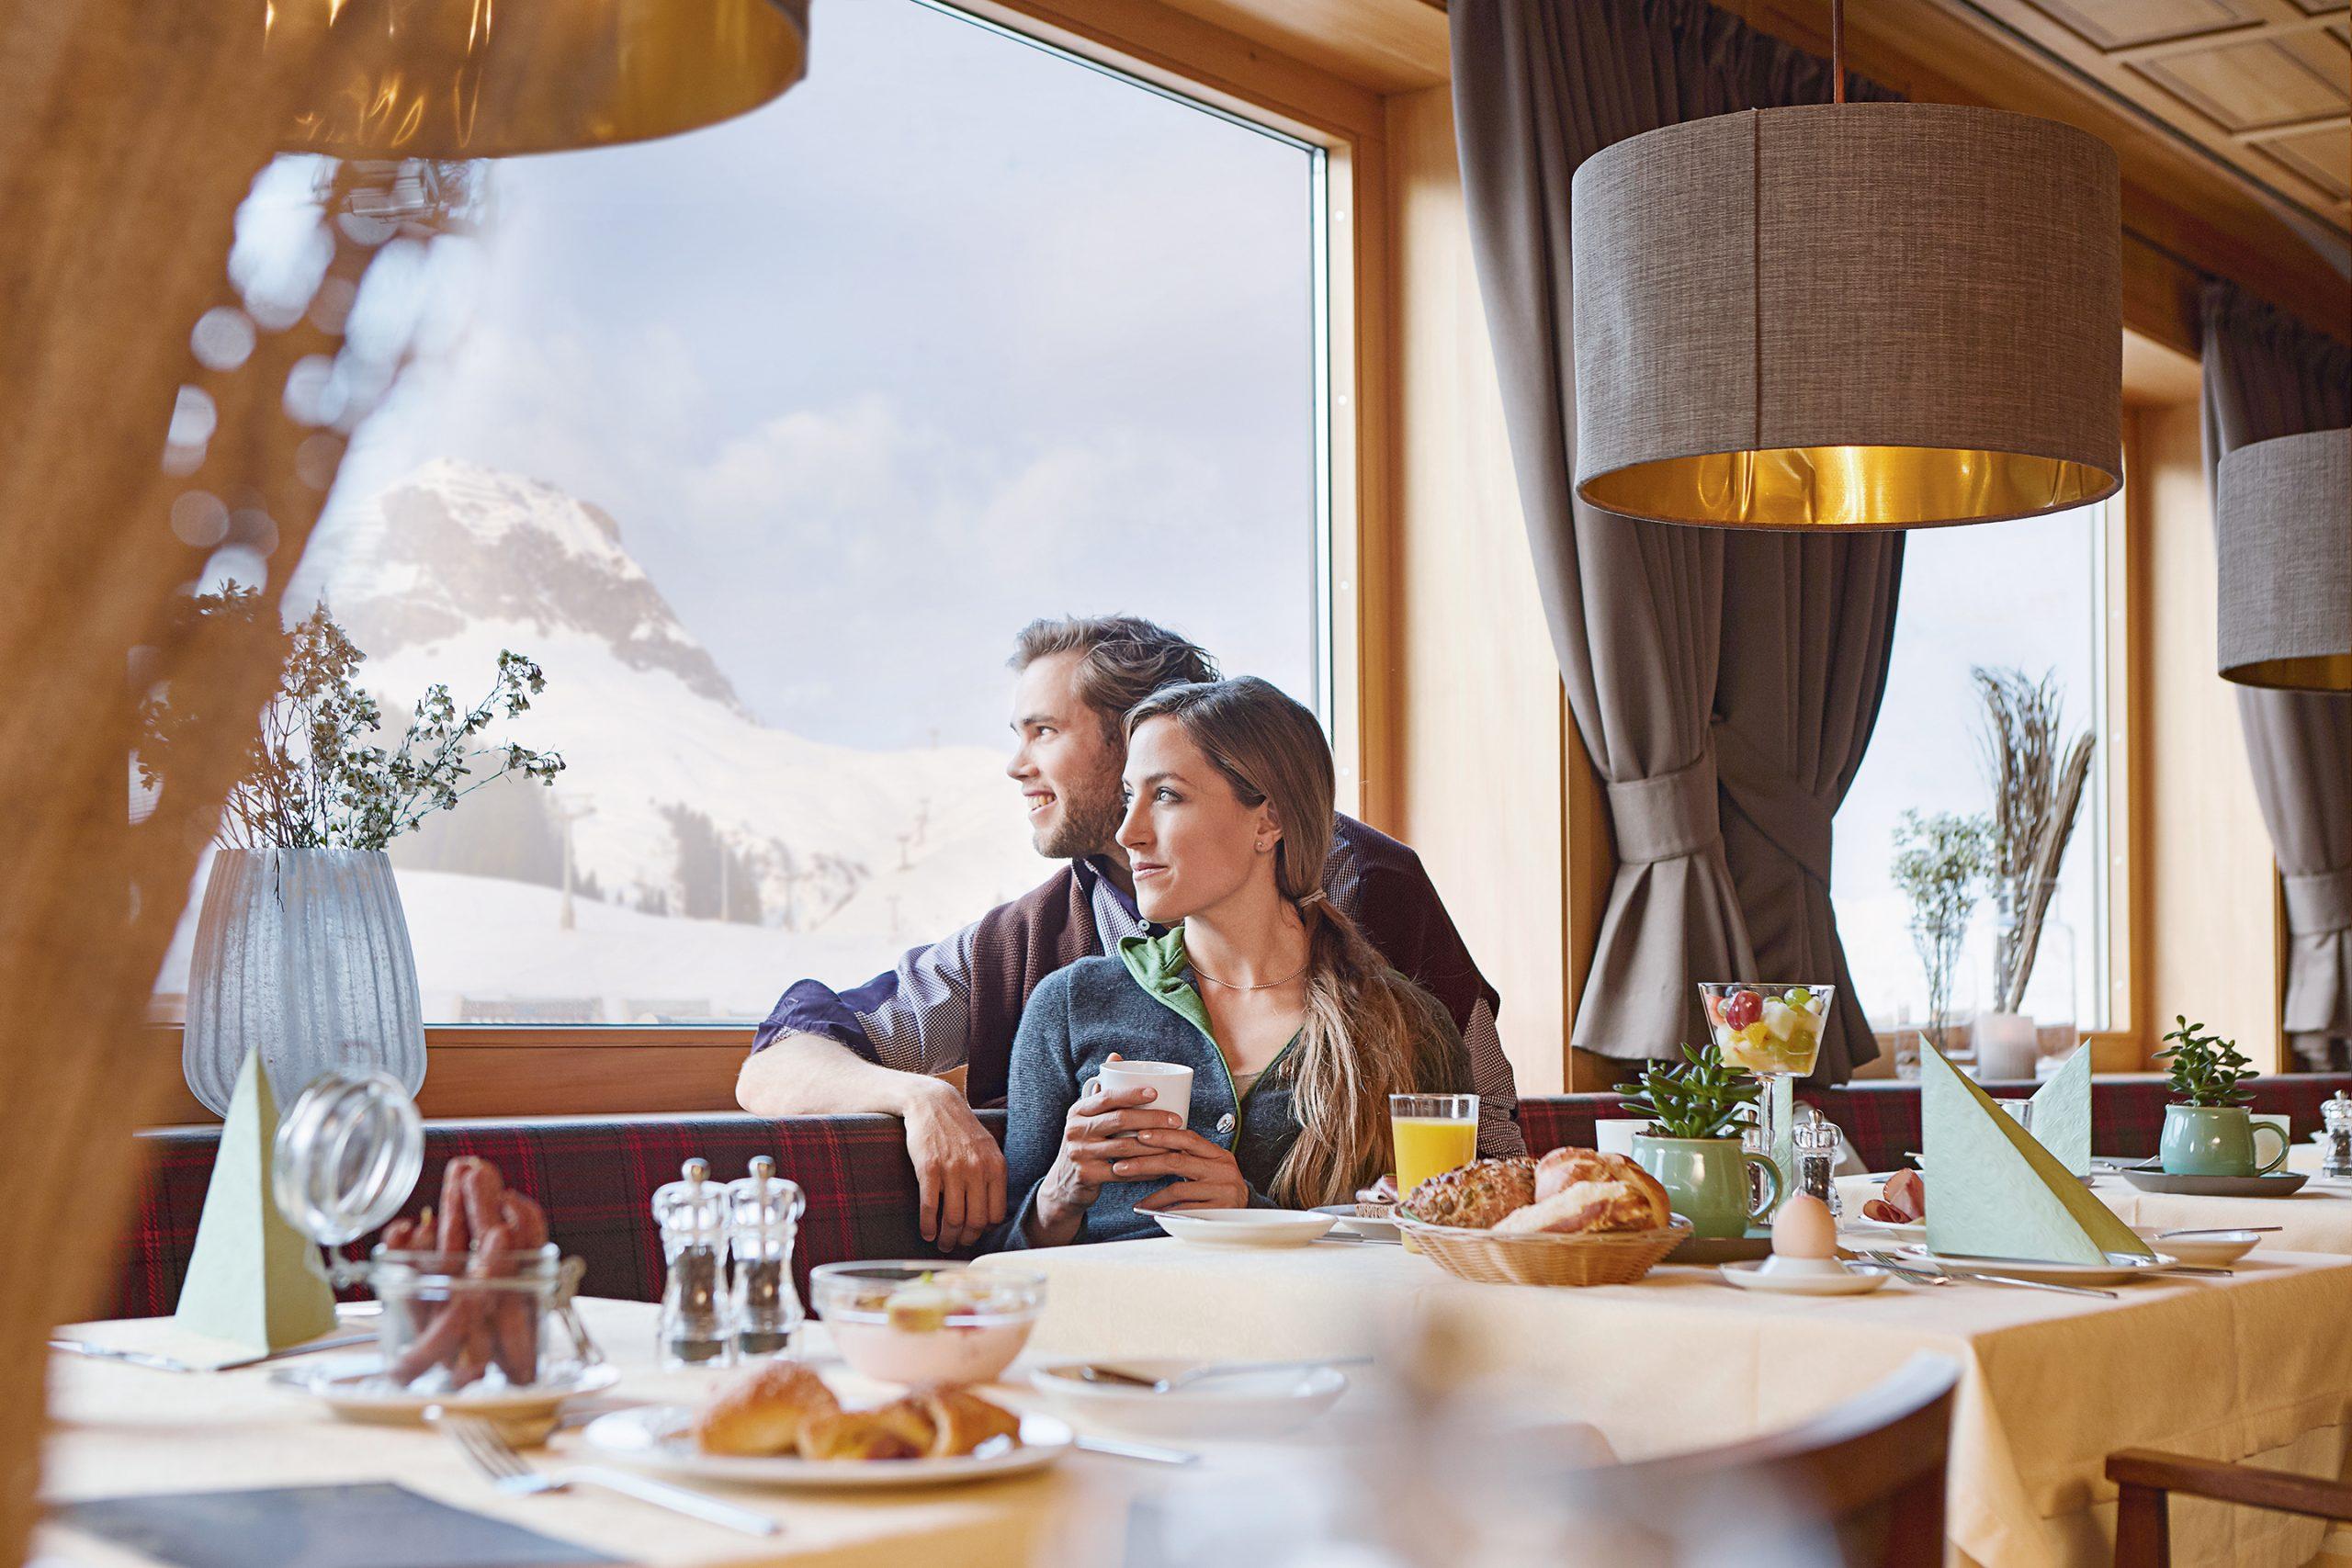 Verwöhnfrühstück im Hotel Steffisalp